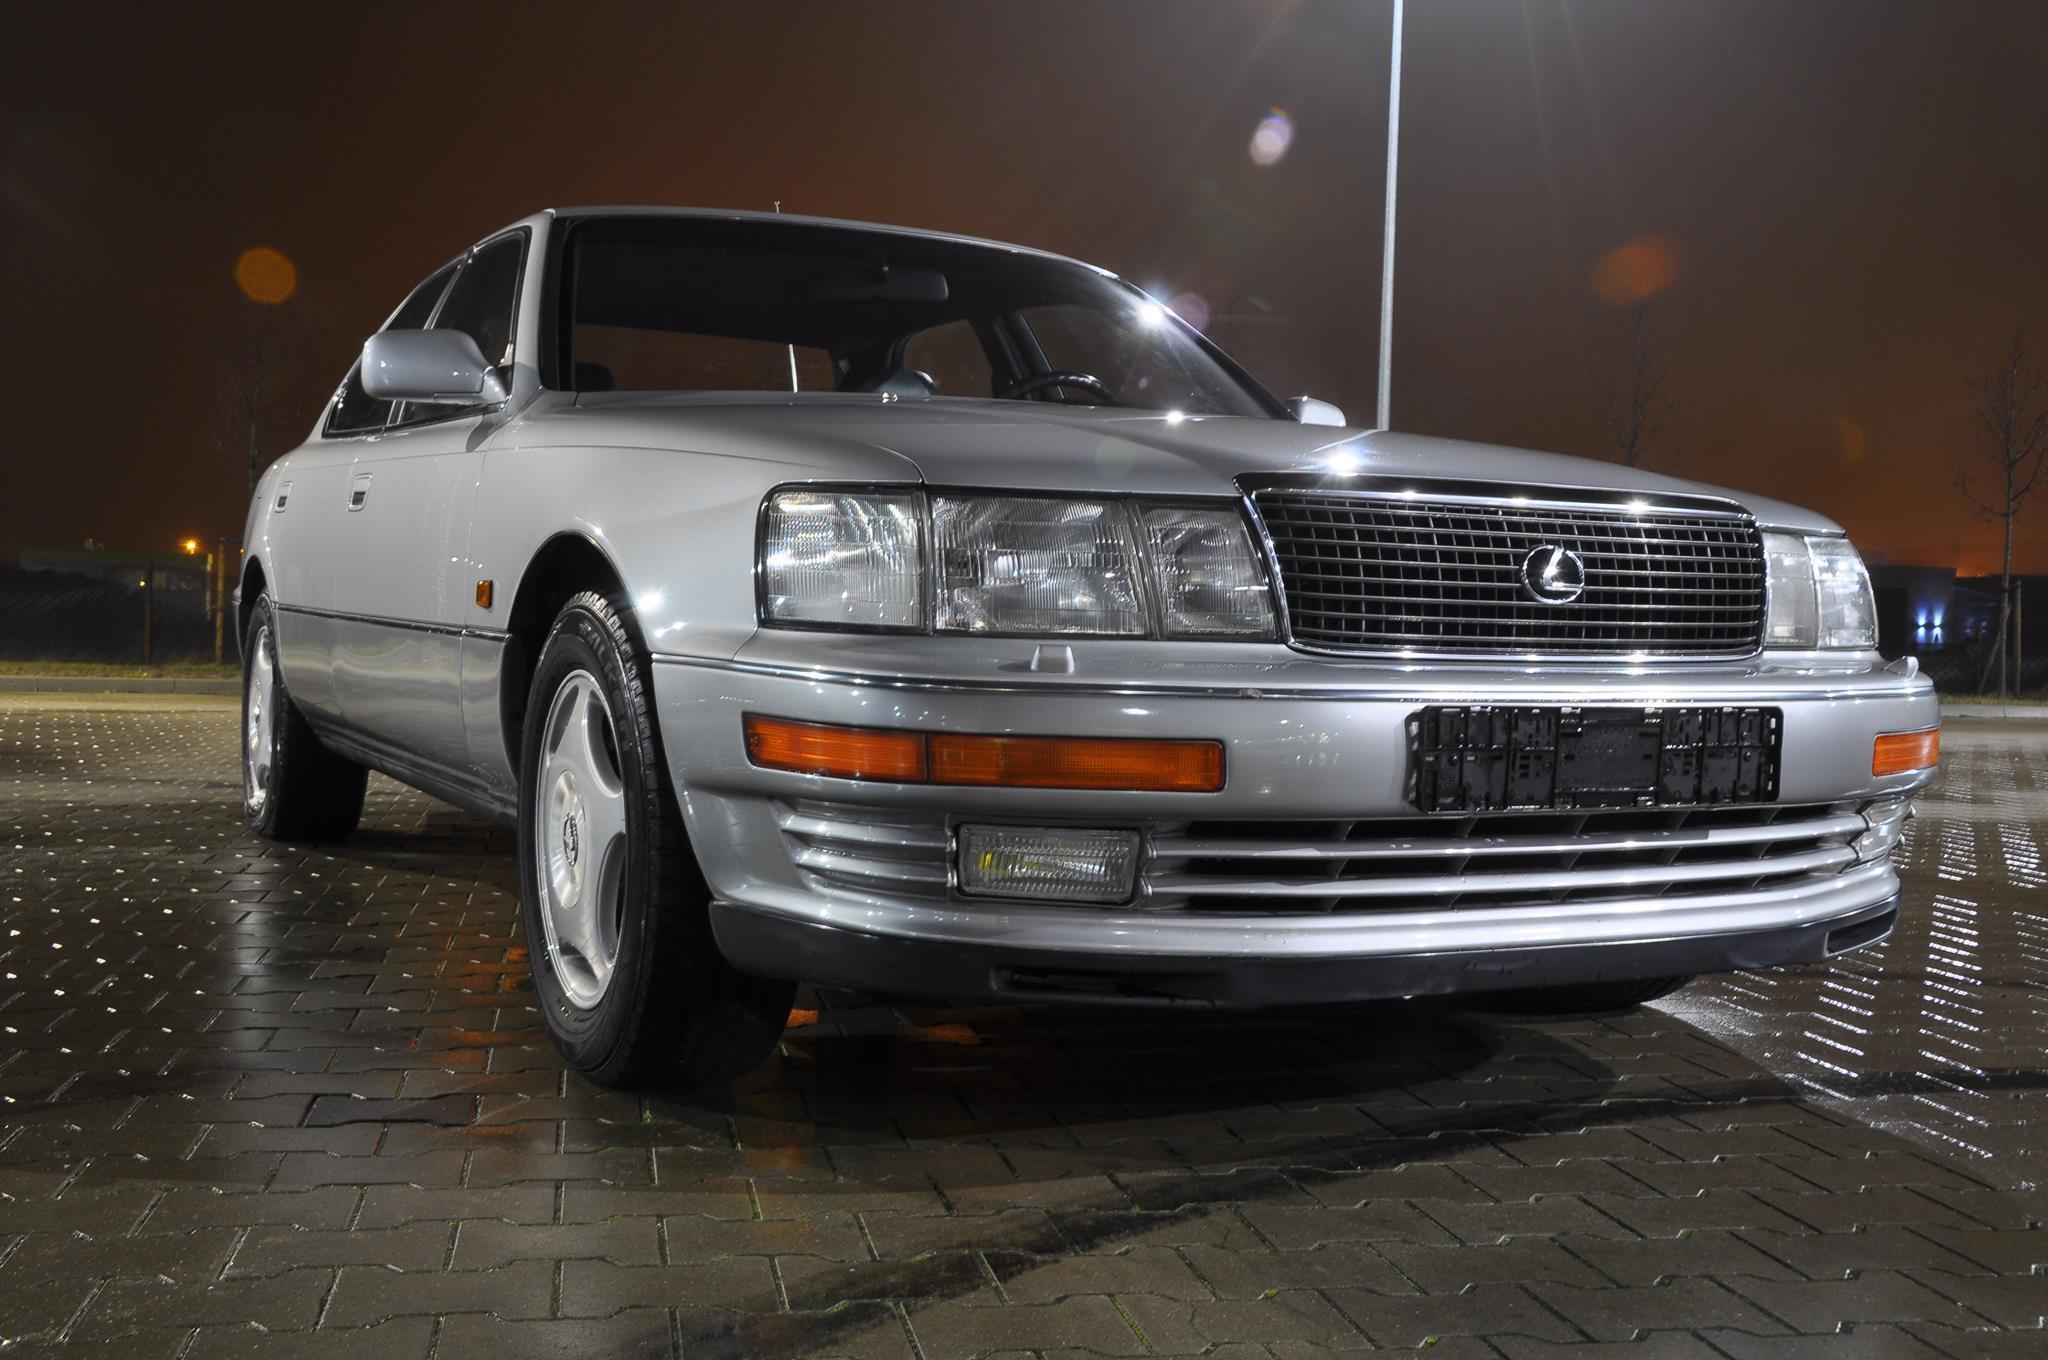 Lexus LS 400 HD Wallpaper